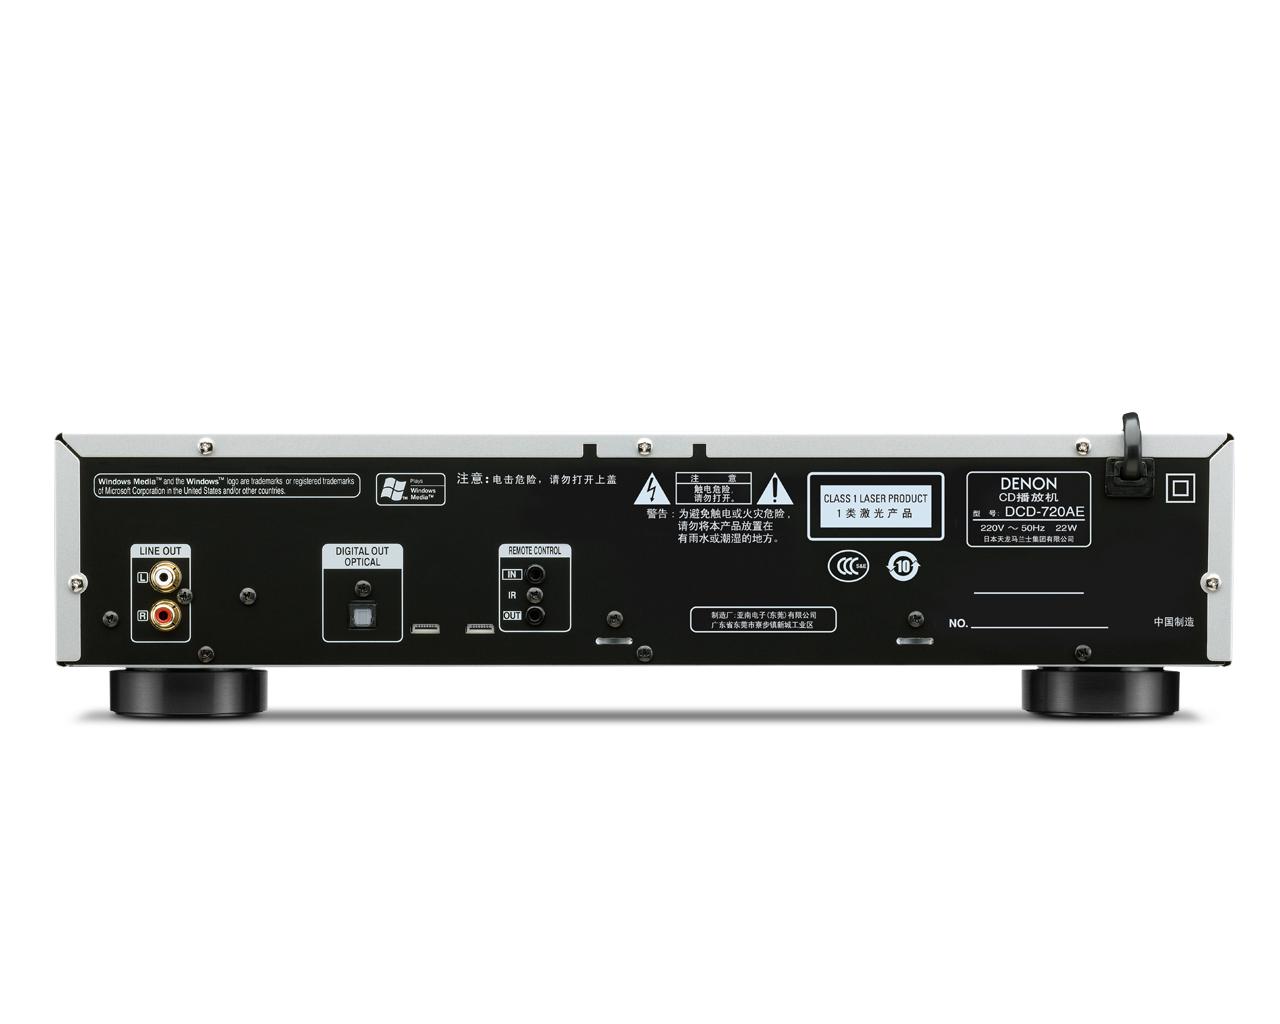 Denon/天龙 DCD-720AE家用专业cd播放机Hifi发烧级cd机转盘